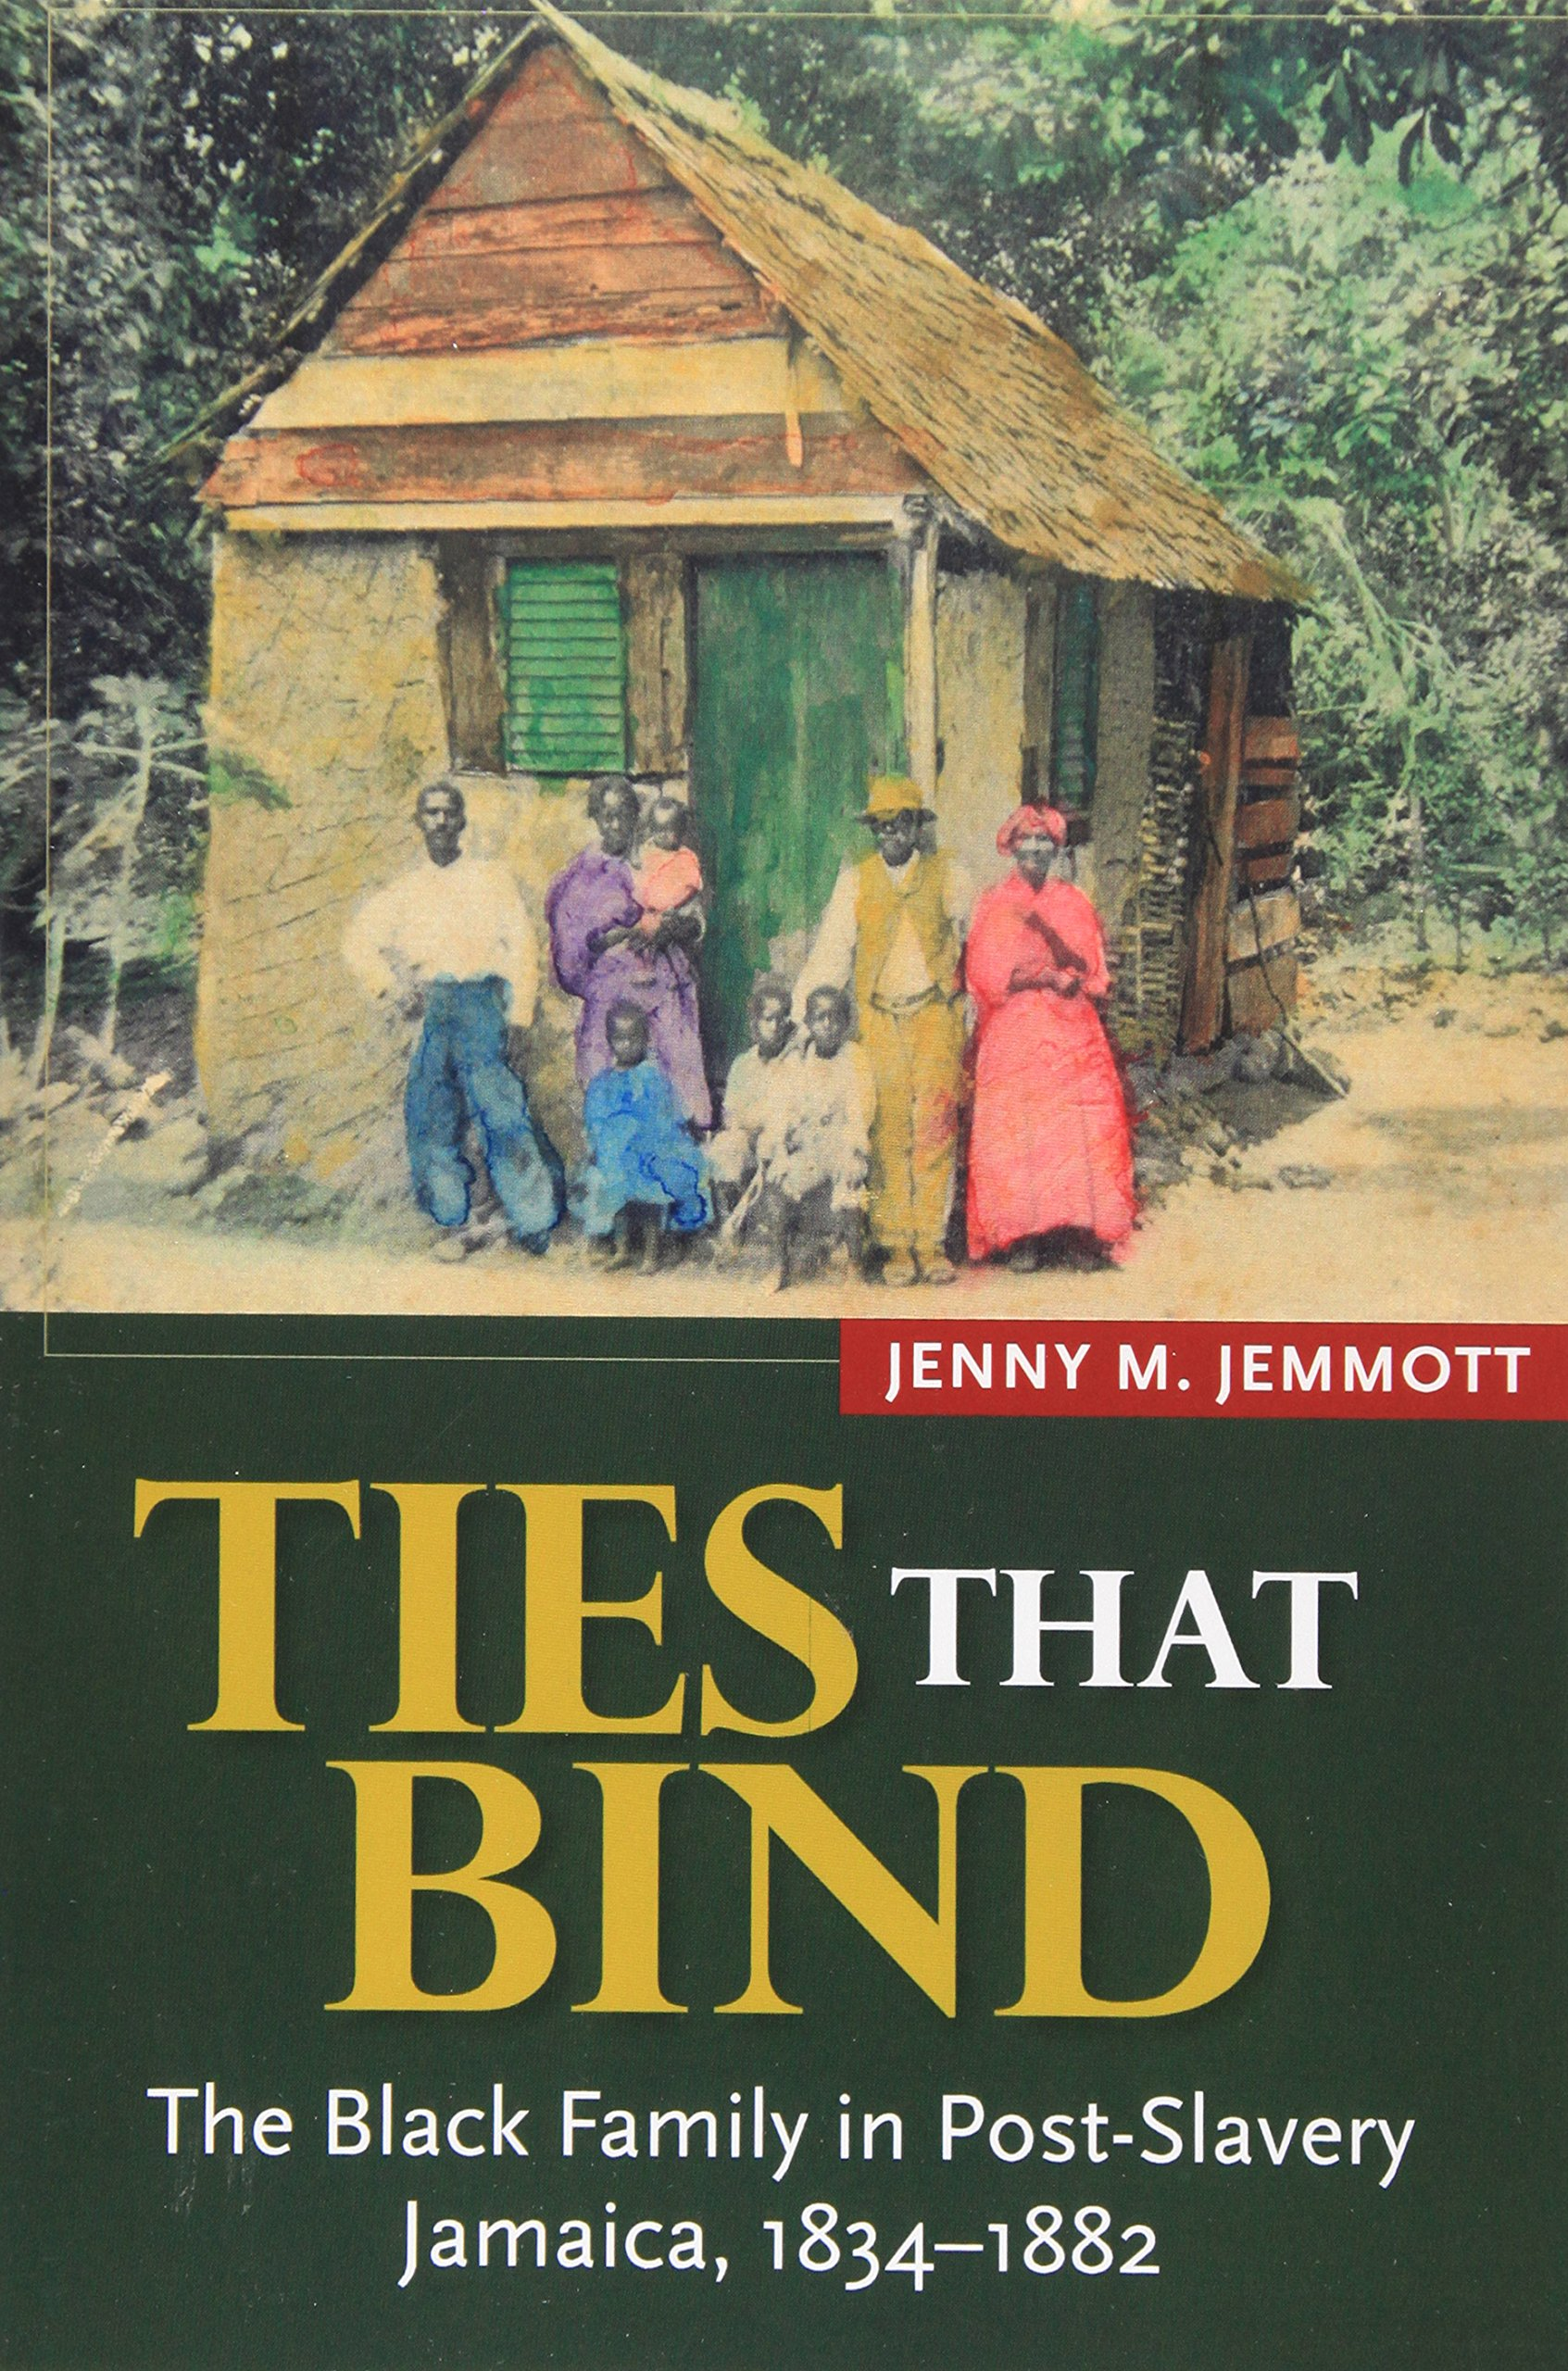 Ties That Bind: The Black Family in Post-Slavery Jamaica, 1834-1882